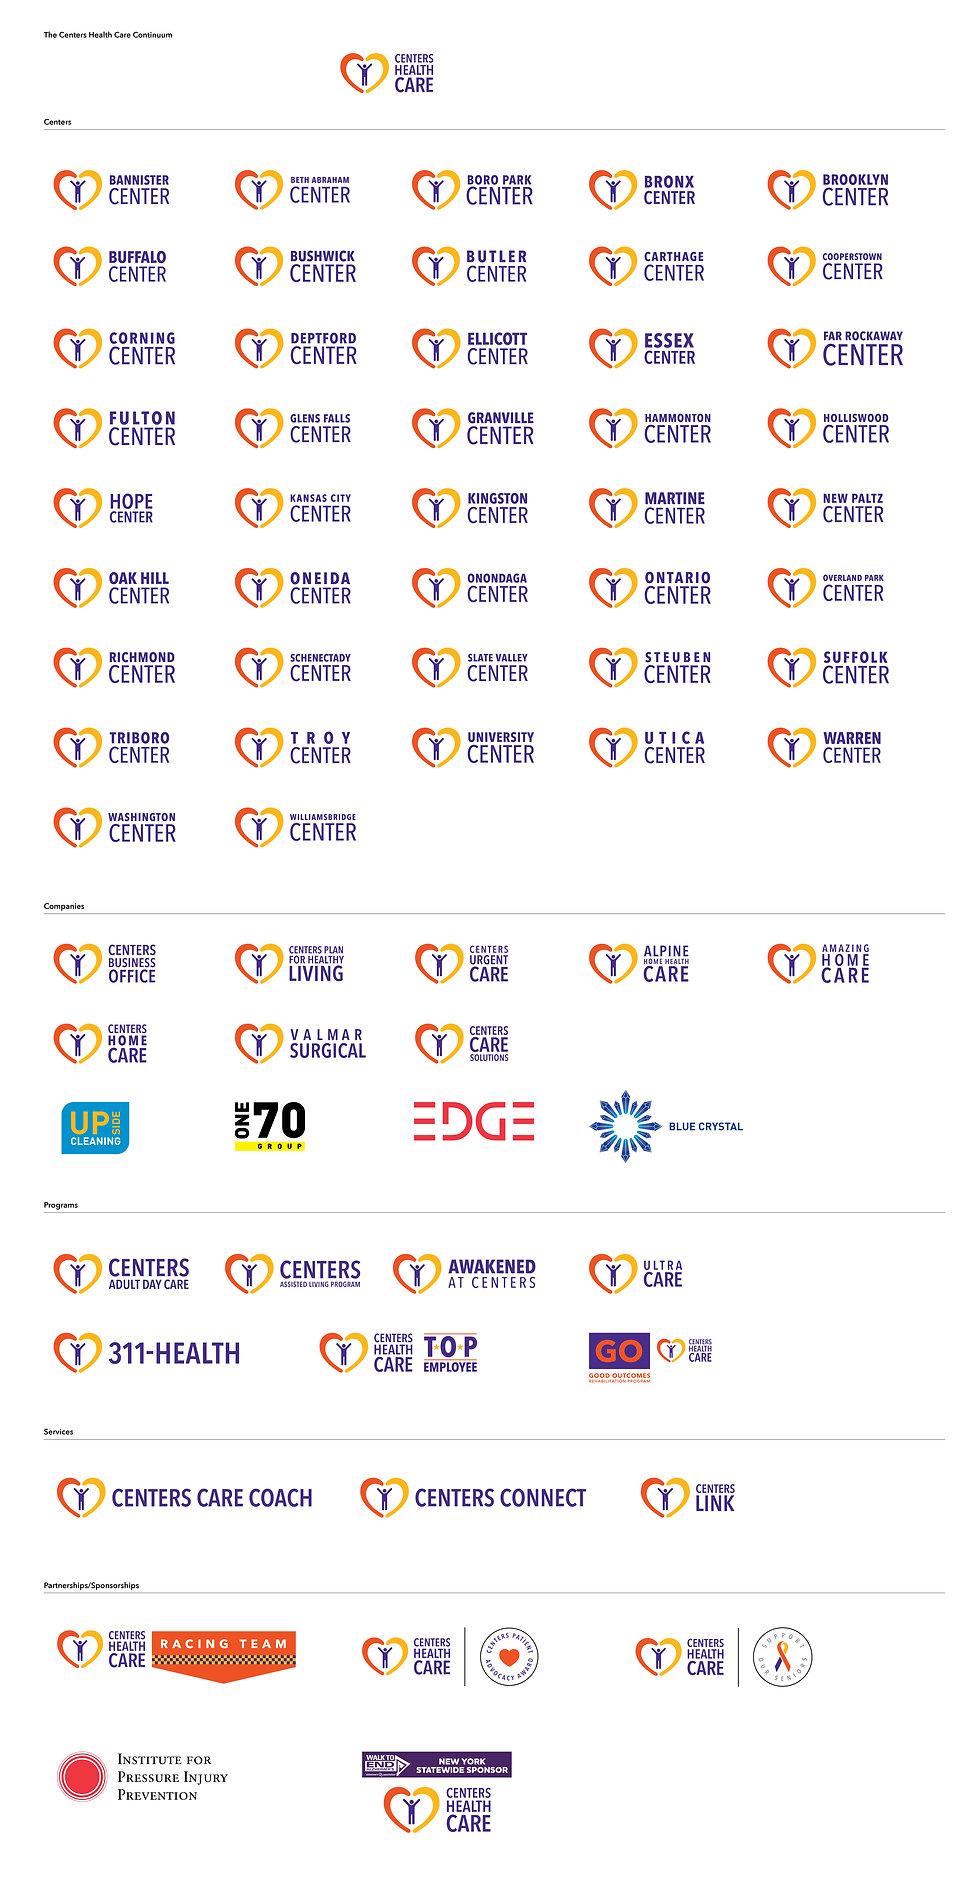 Continuum Organization Chart_2020.jpg